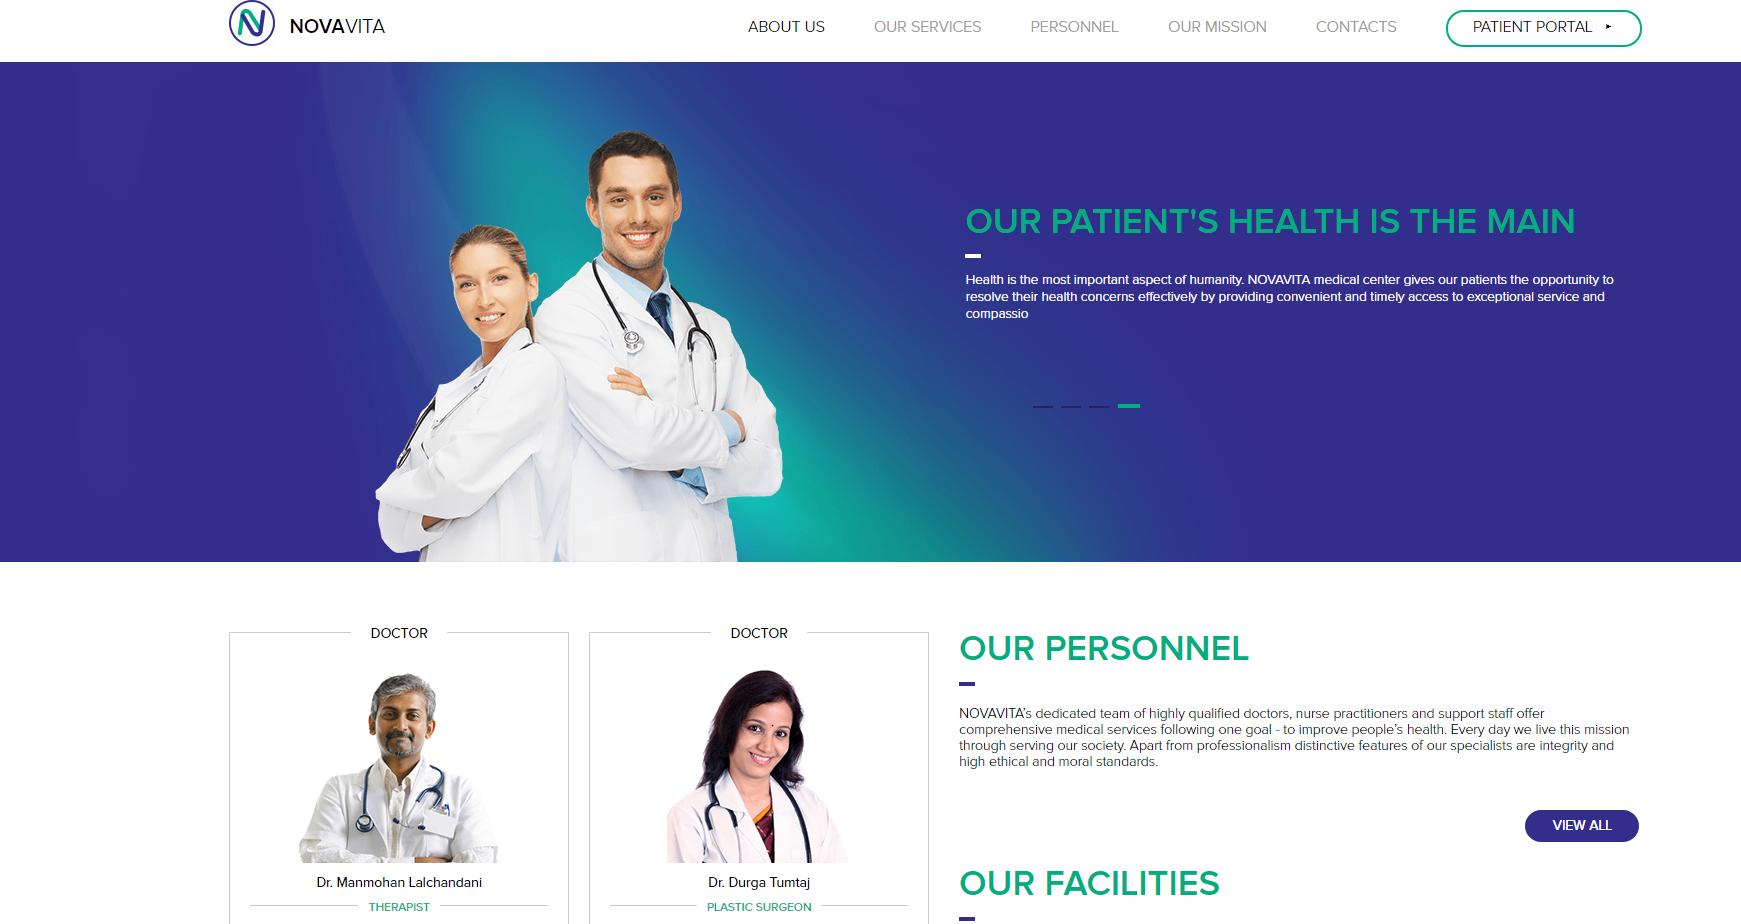 The homepage of Nova Vita